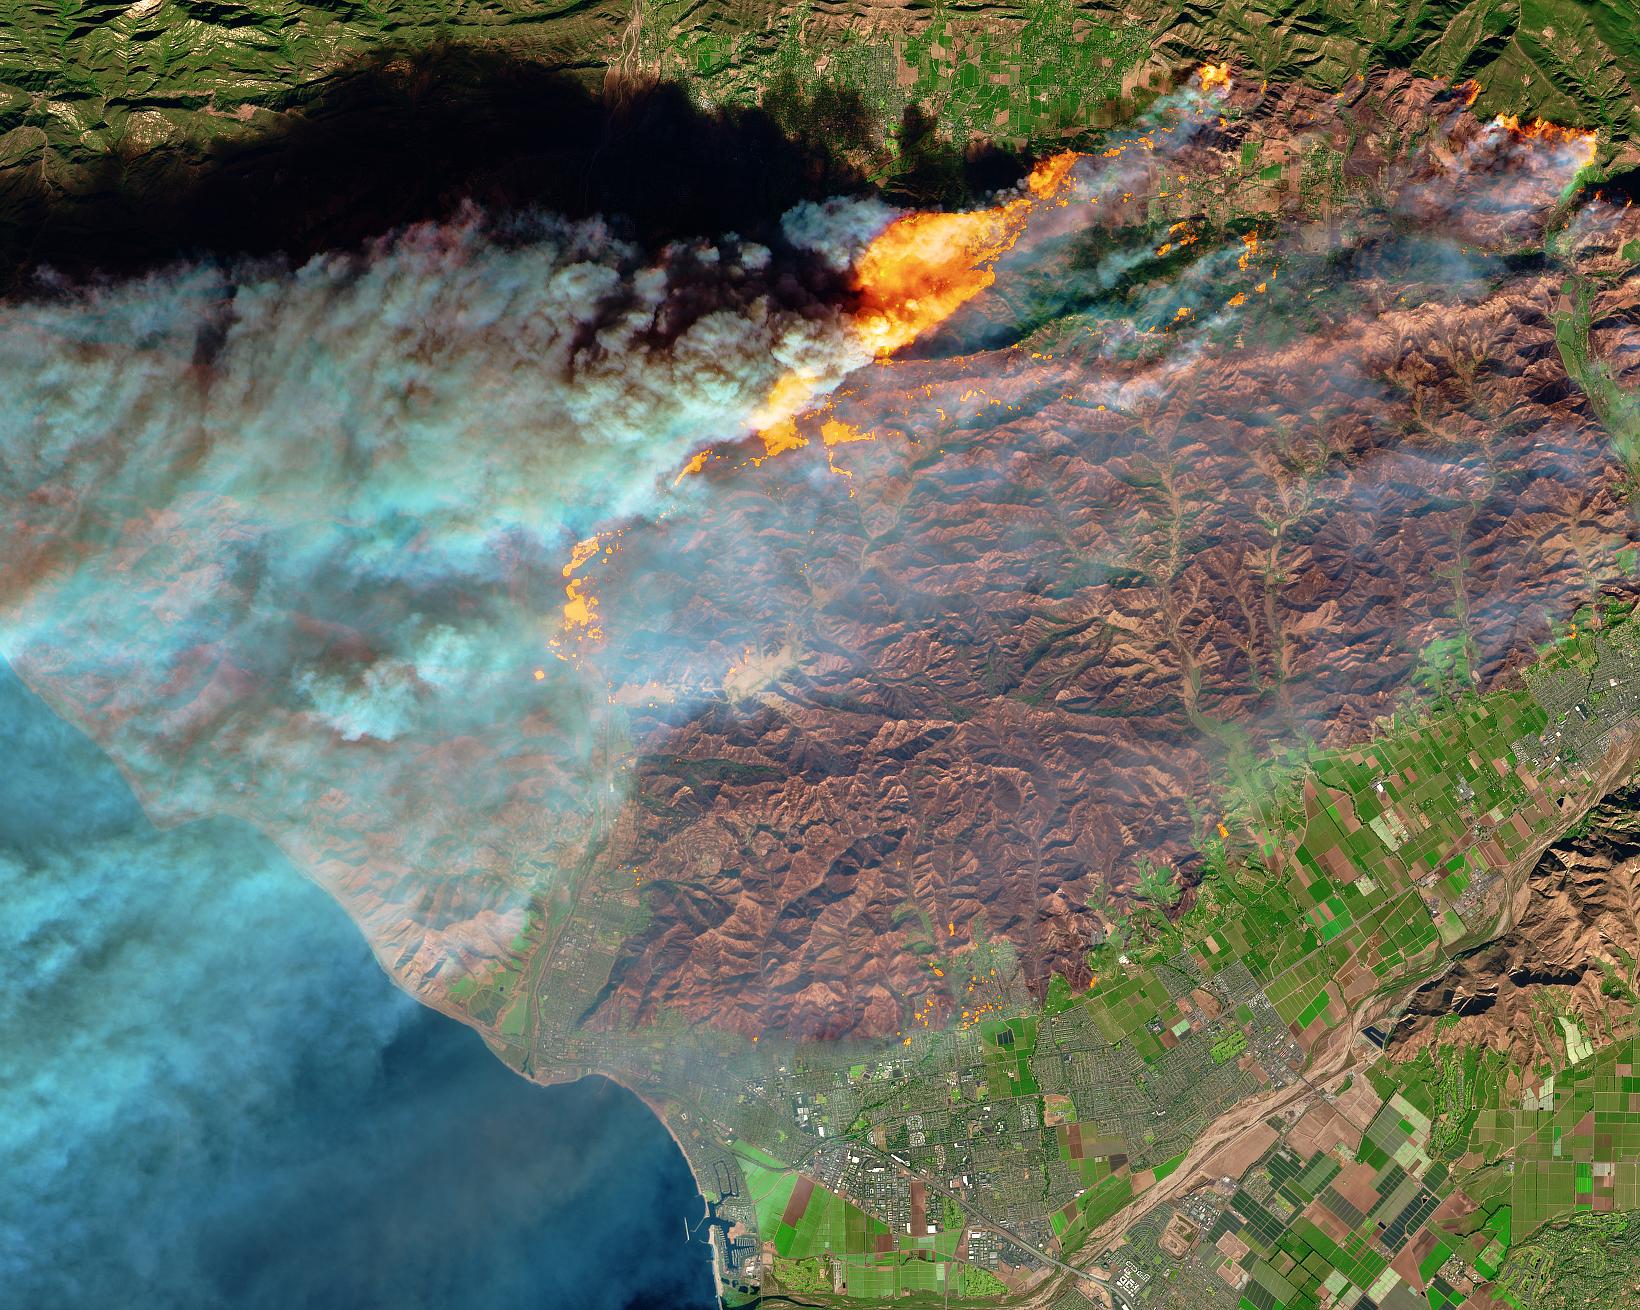 Ventura Fire Satellite >> Fire in Ventura County, California | NASA